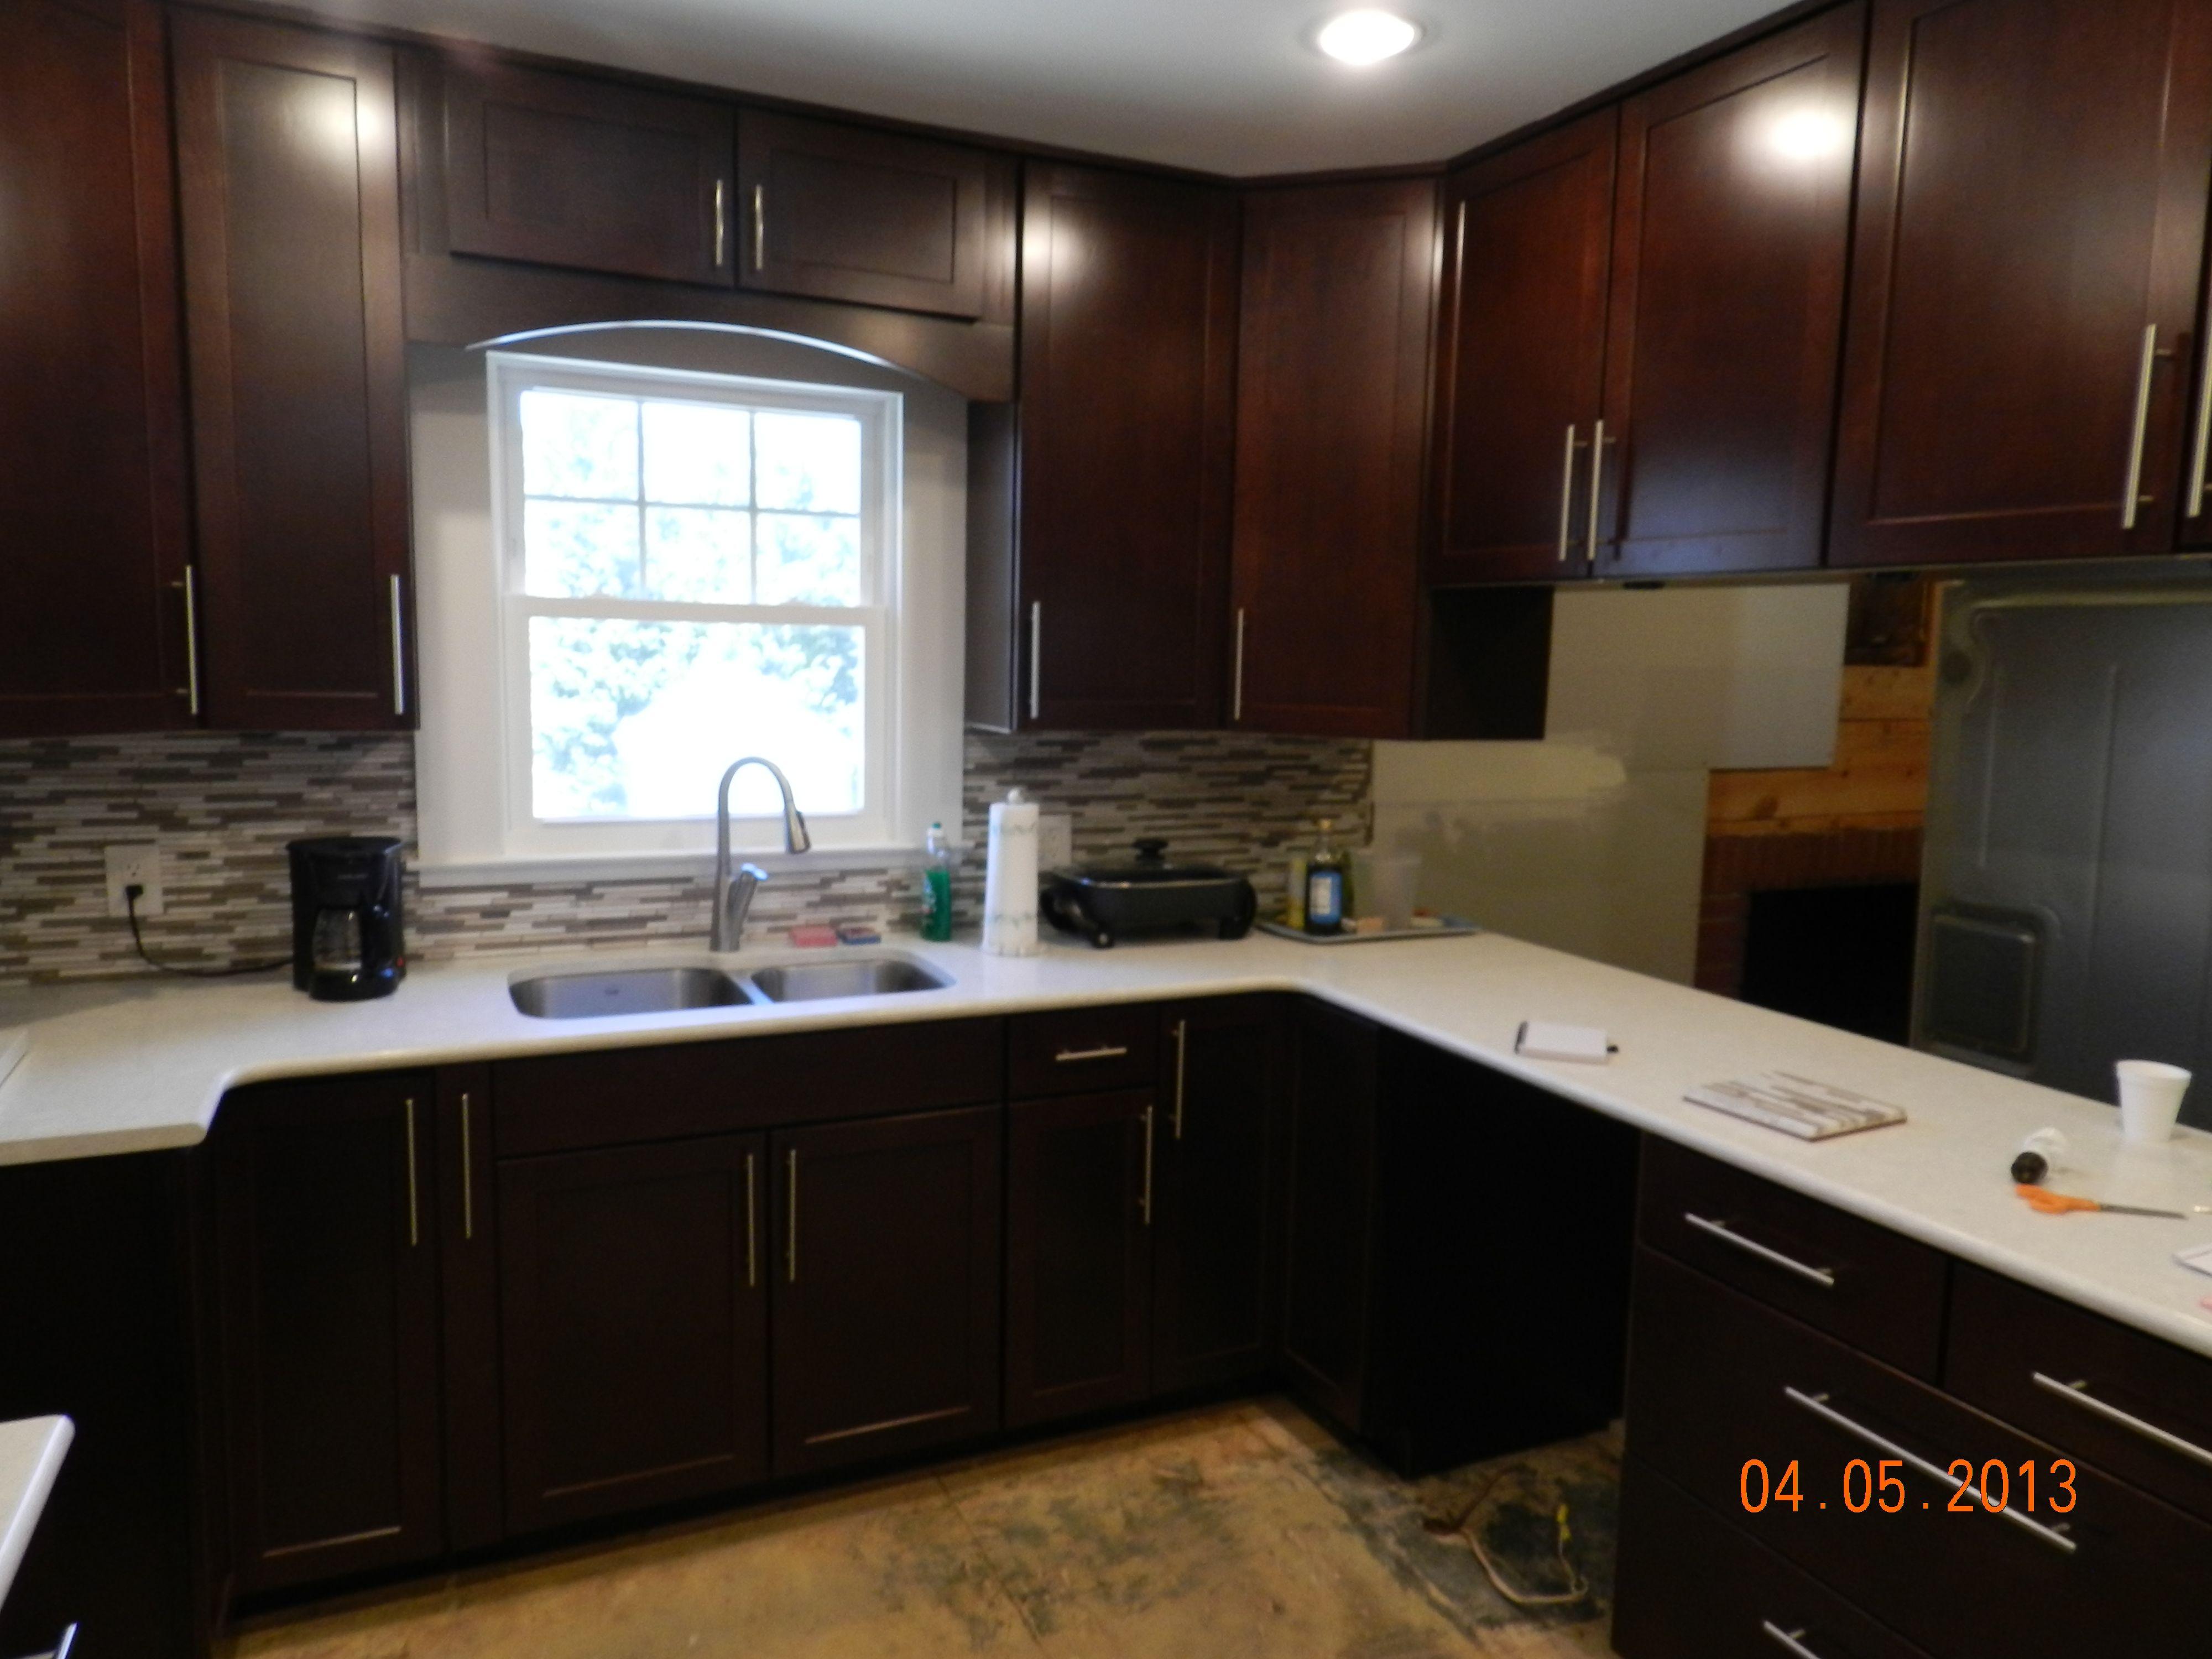 Waypoint Cabinets-410S Cherry Bordeaux design by Carpet ...